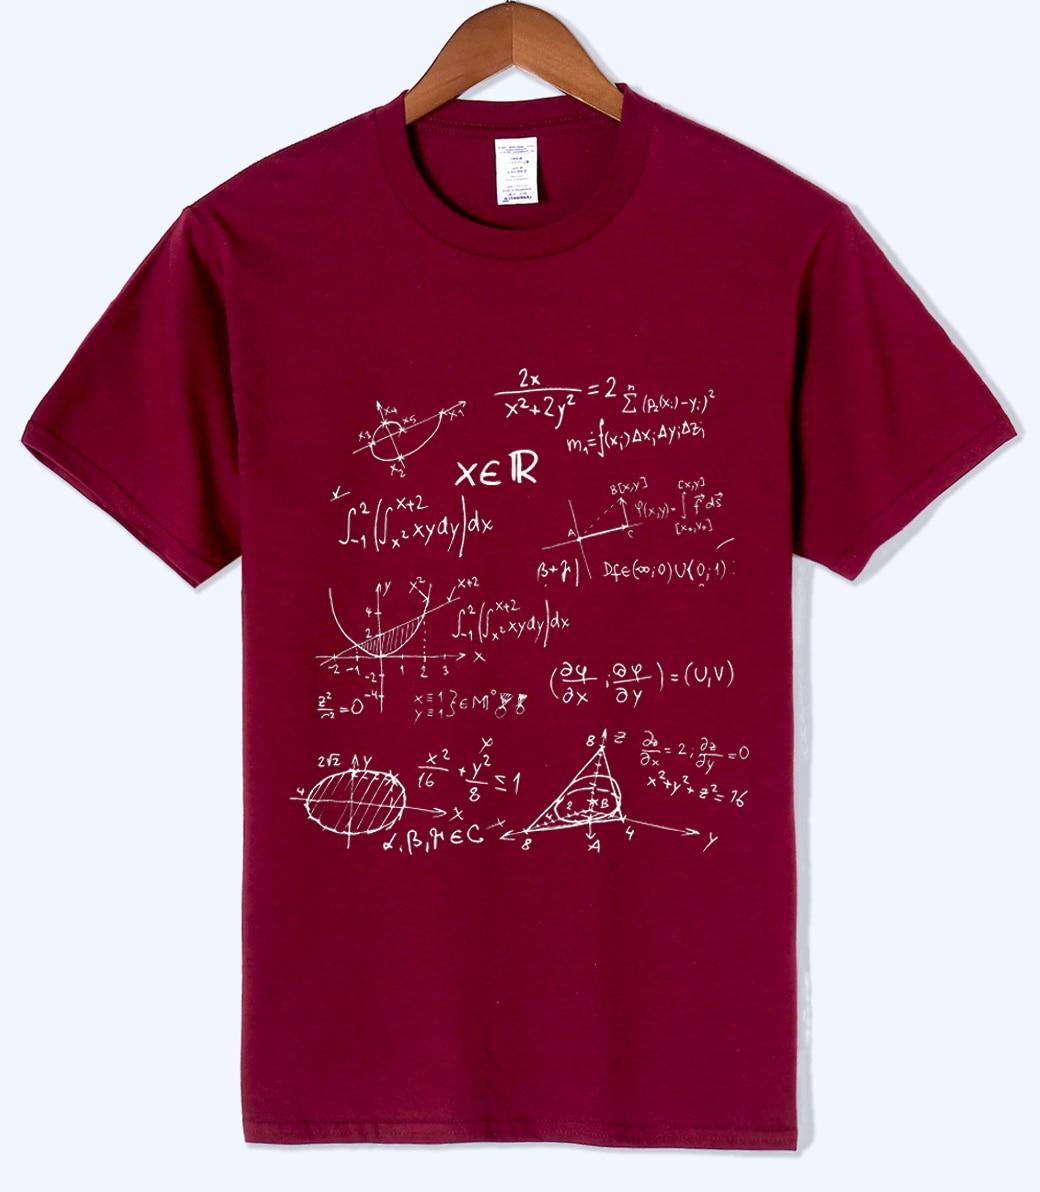 T-shirt 2019 summer Mathematical Formula men's T-shirts The Big Bang Theory t shirt men sportwear brand-clothing top tees cotton